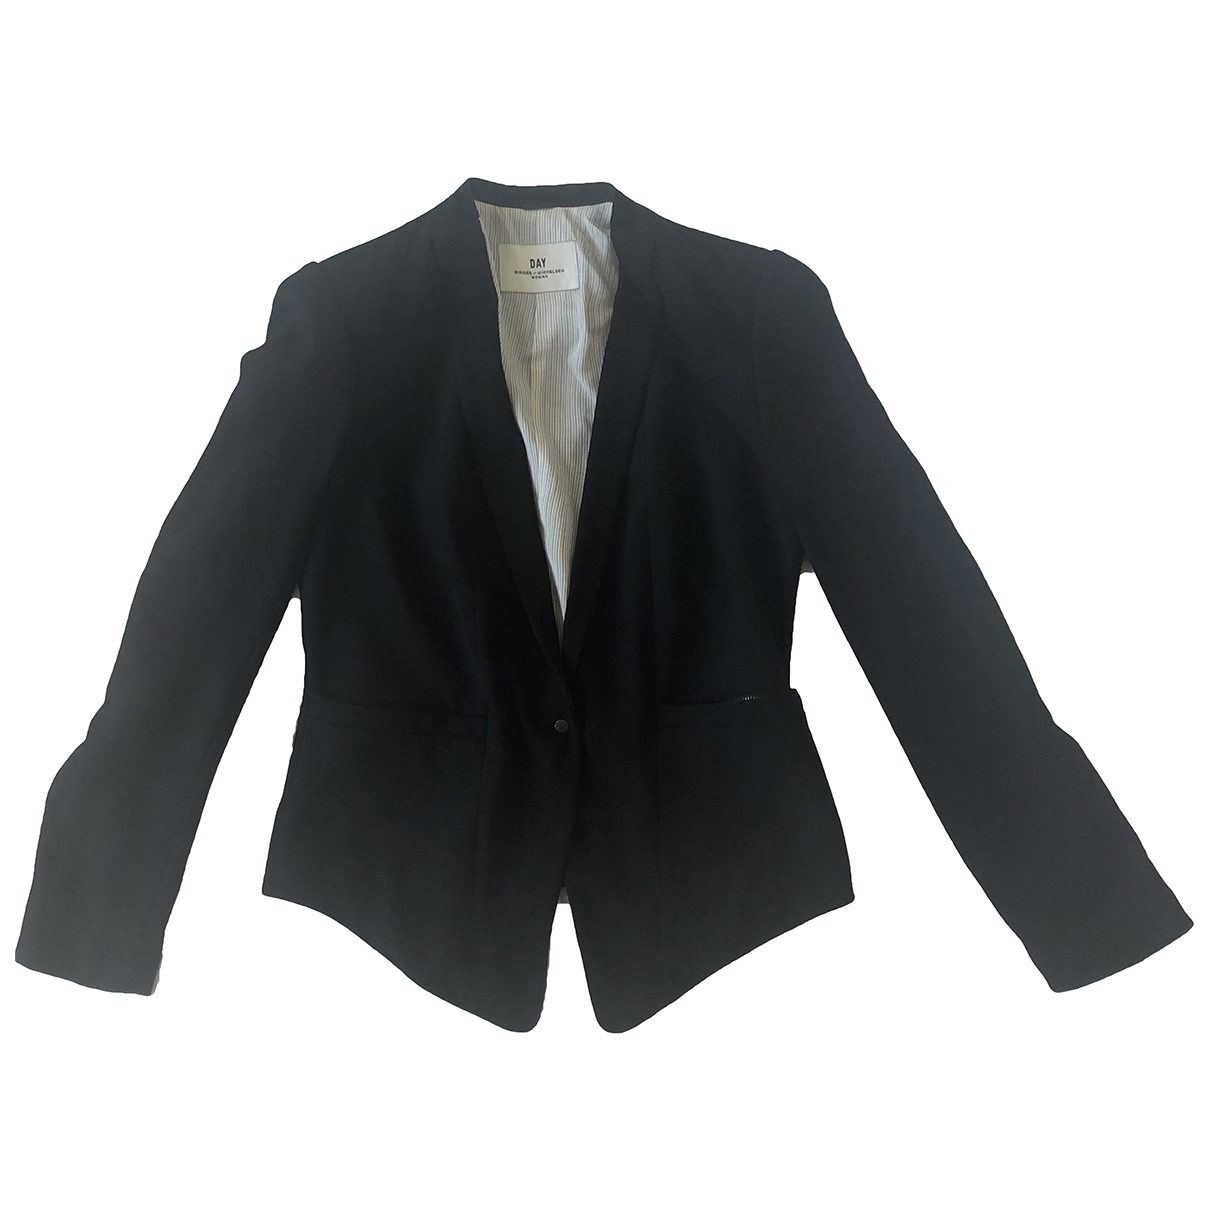 Day Birger & Mikkelsen \N Black jacket for Women 12 UK